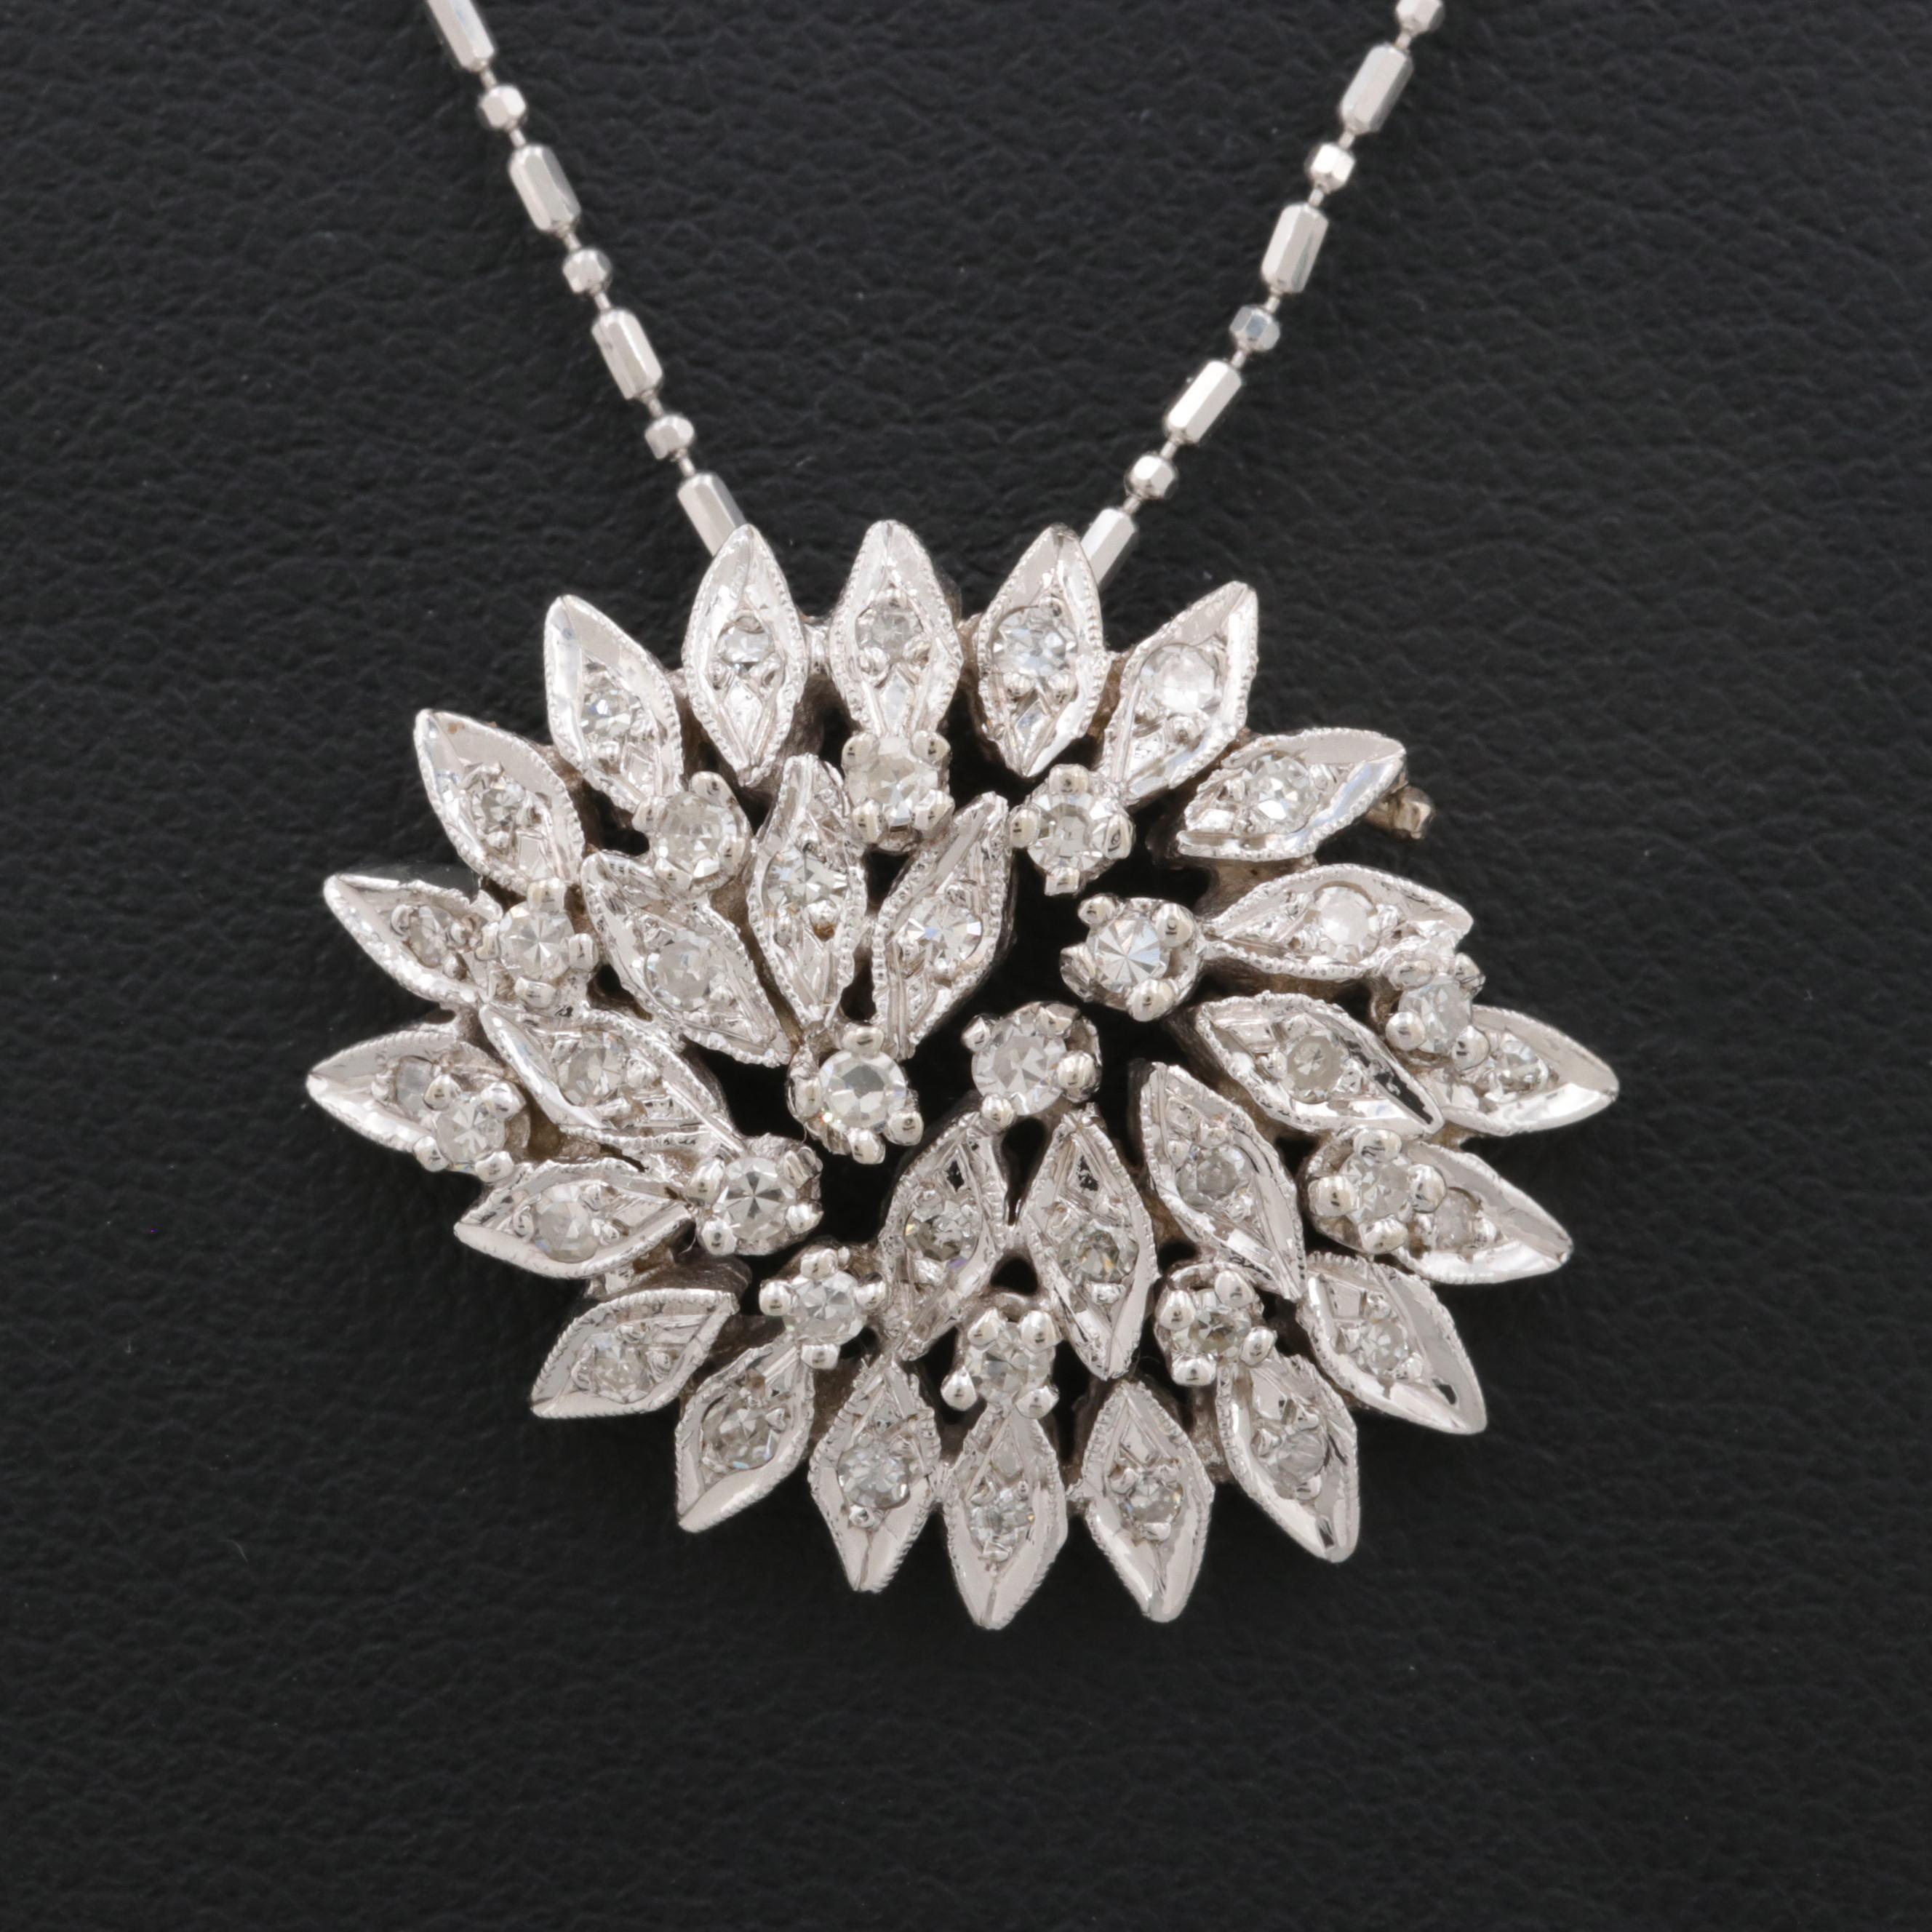 Circa 1950's 14K White Gold Diamond Necklace